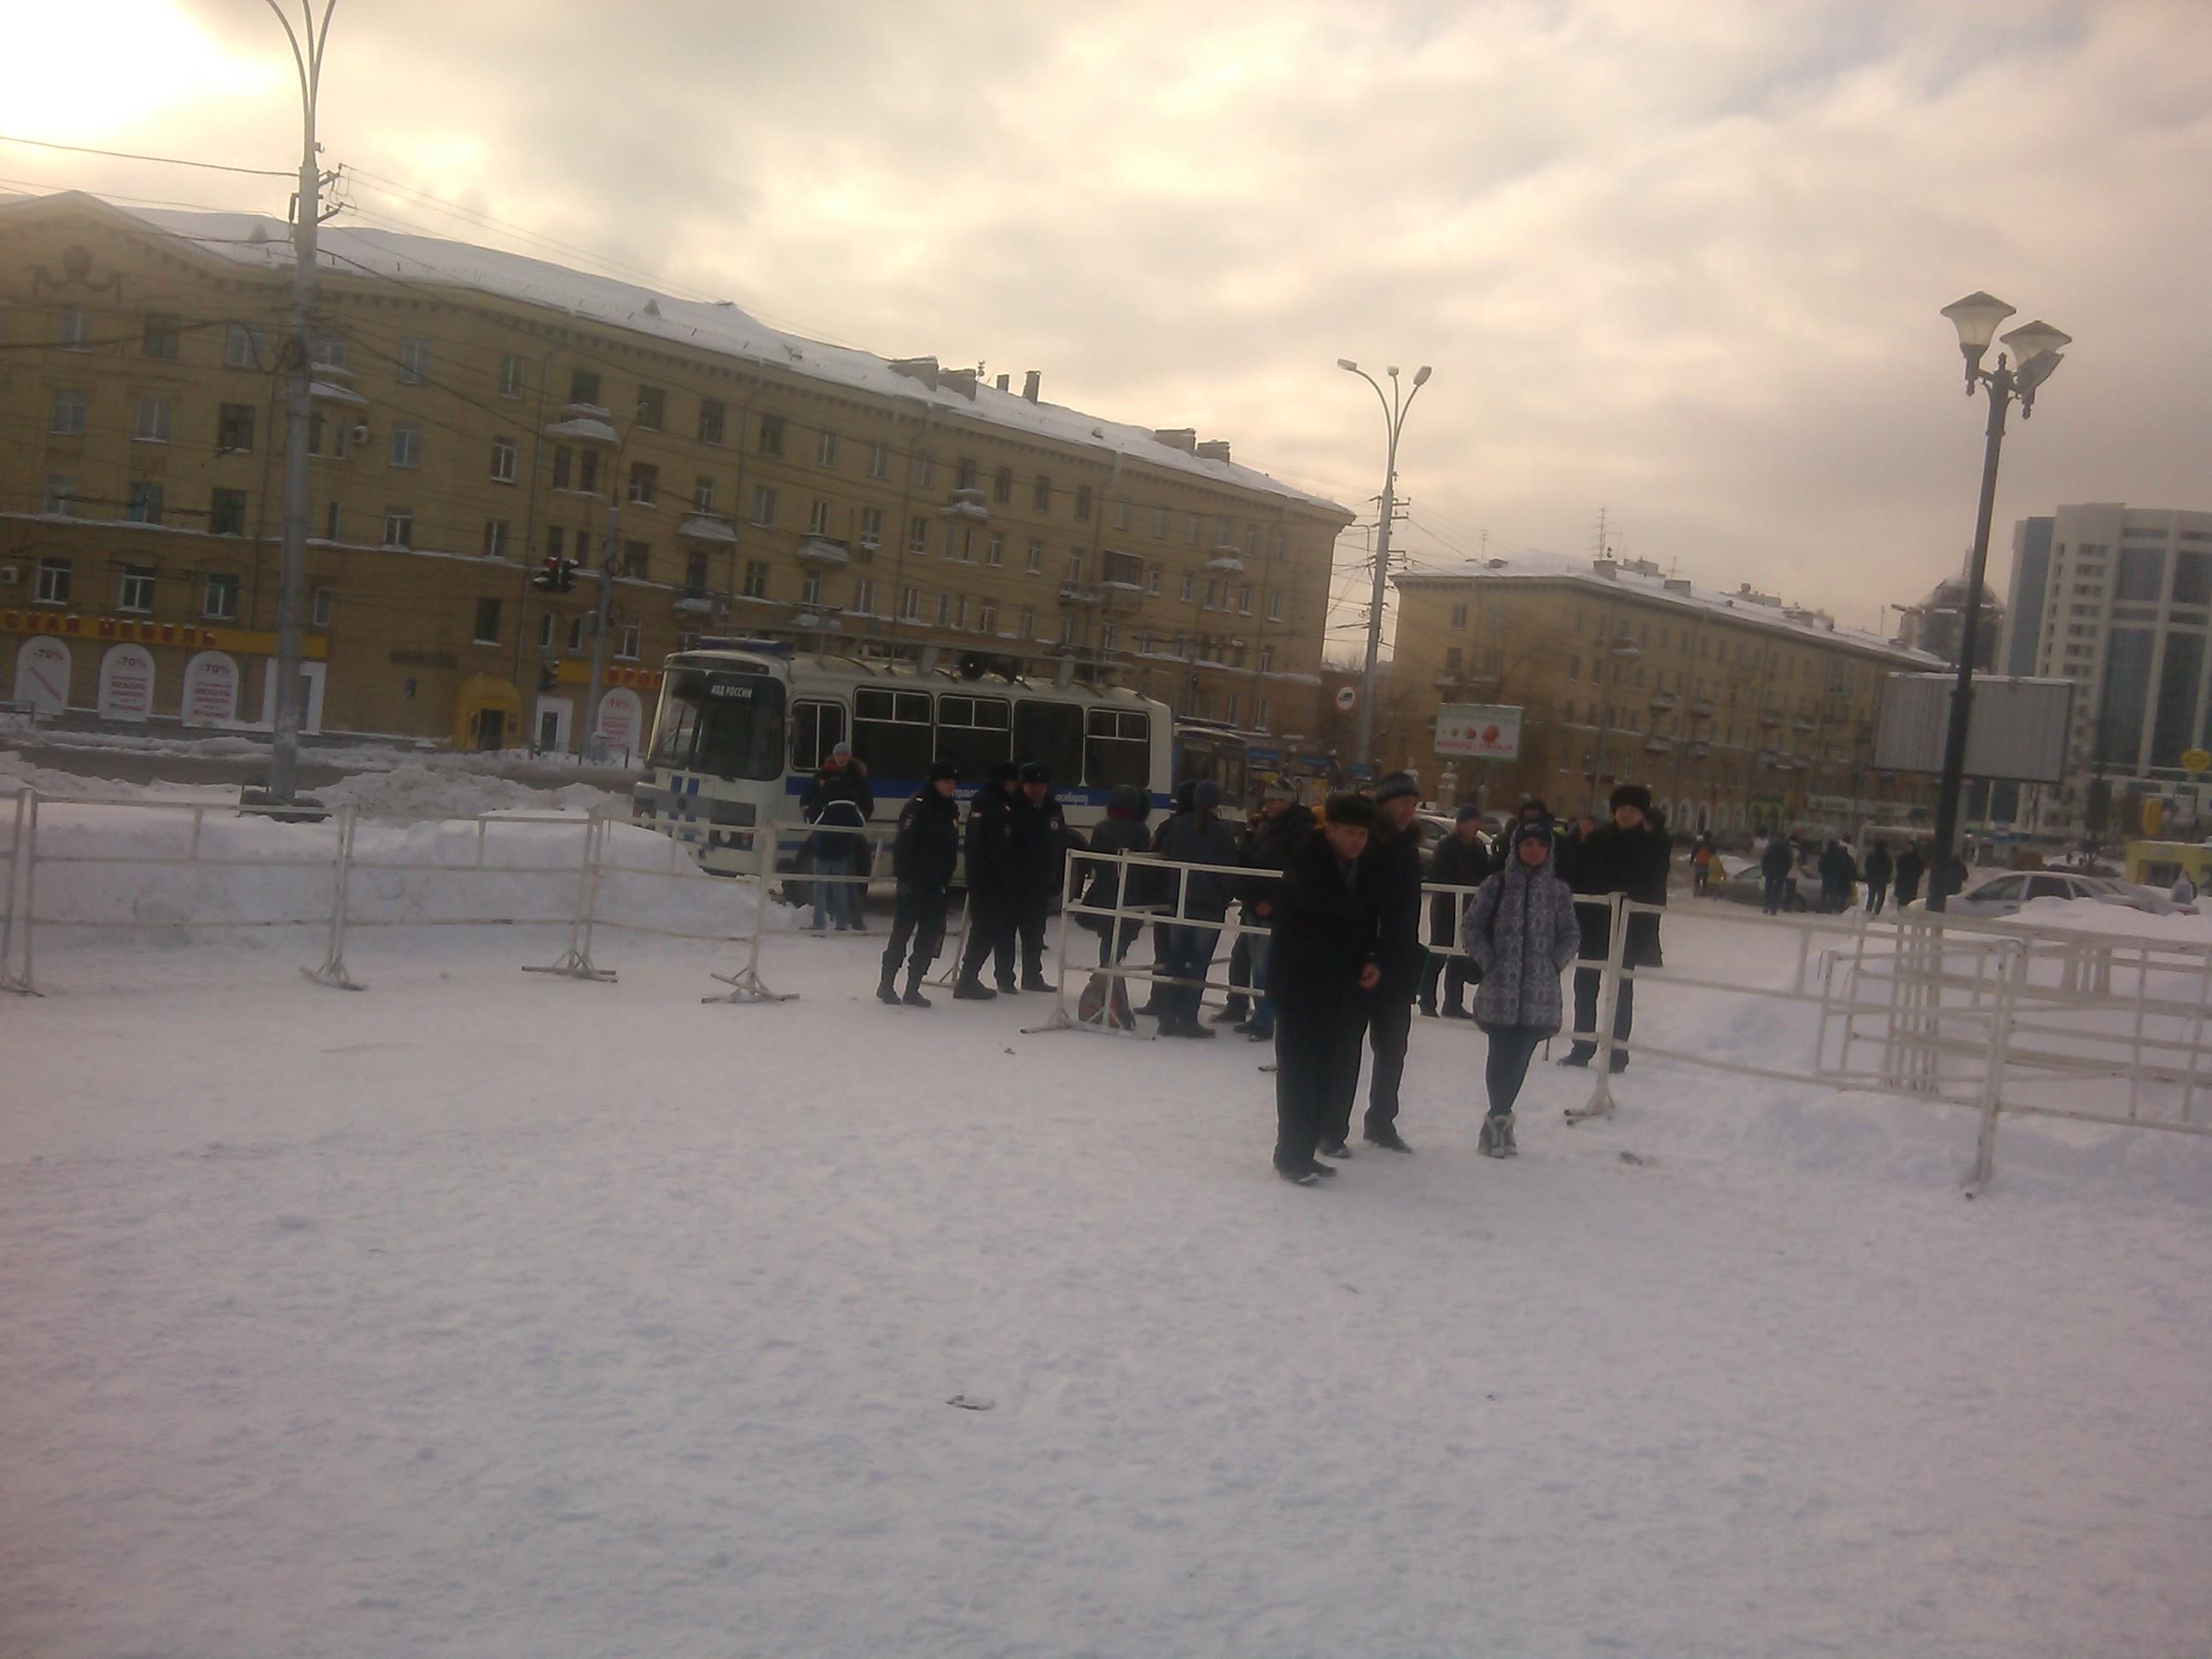 01.03.15 Фото Александра Рудницкого 5